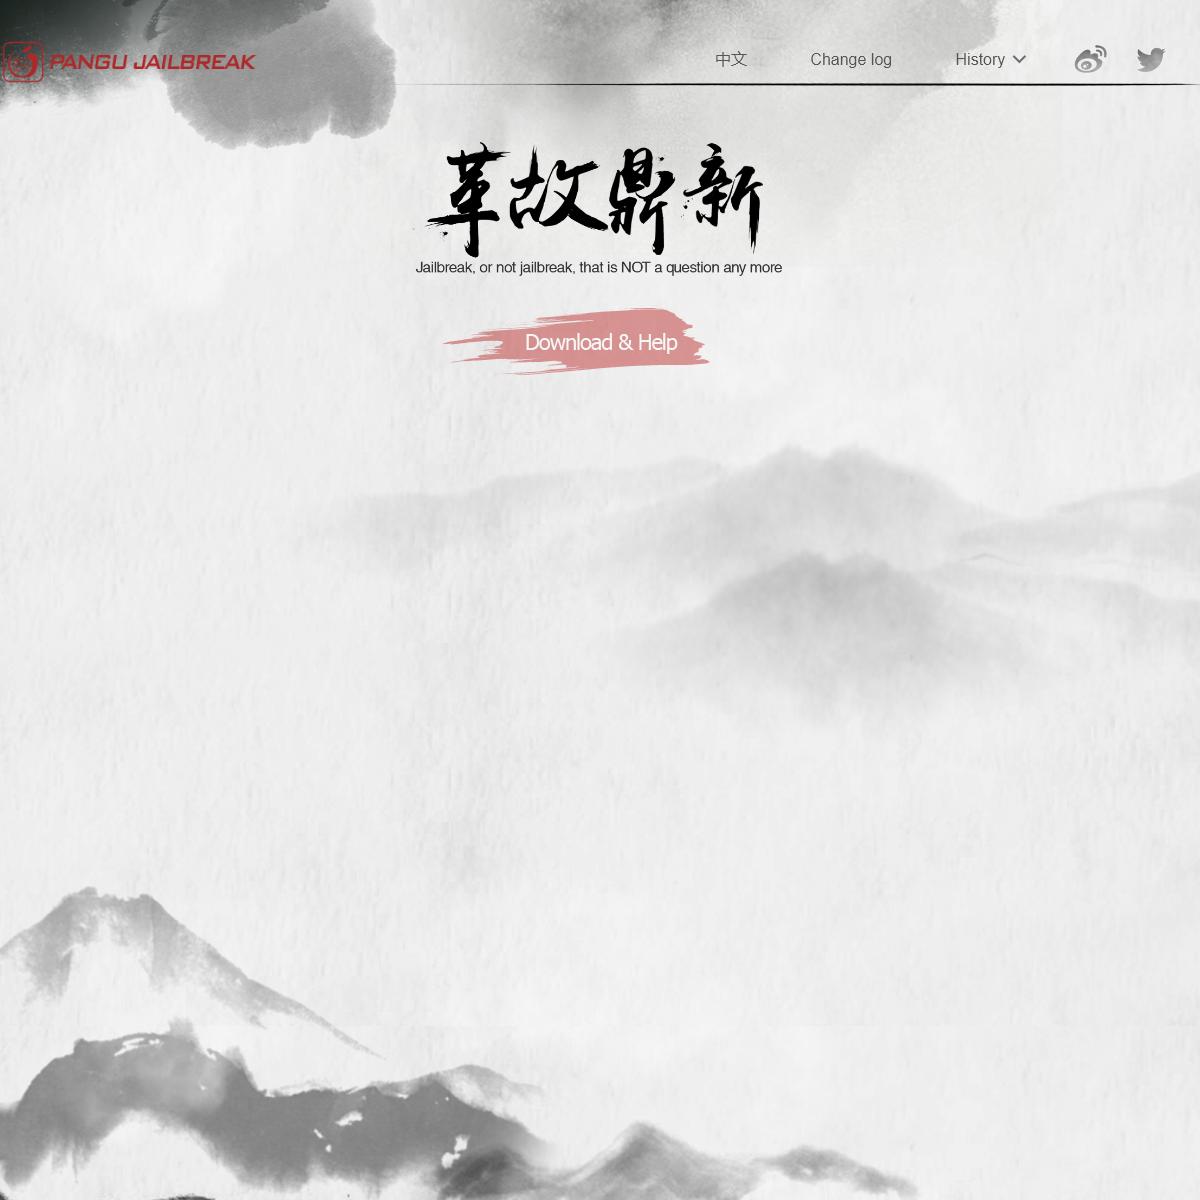 PanGu iOS 9.2 - 9.3.3 jailbreak tool - pangu.io